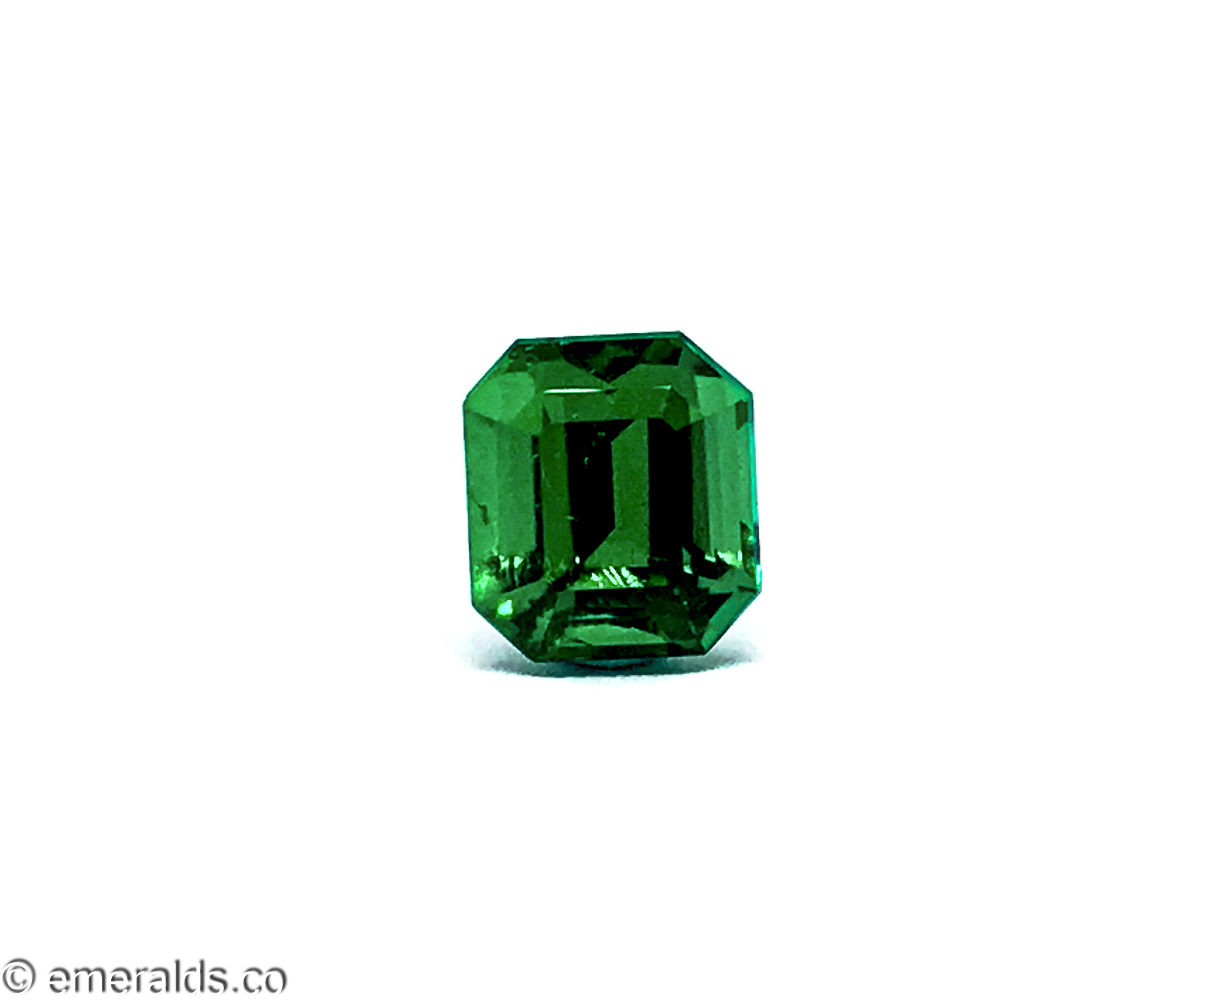 1.82 Fine Colombian Emerald Cut Minor Muzo Green